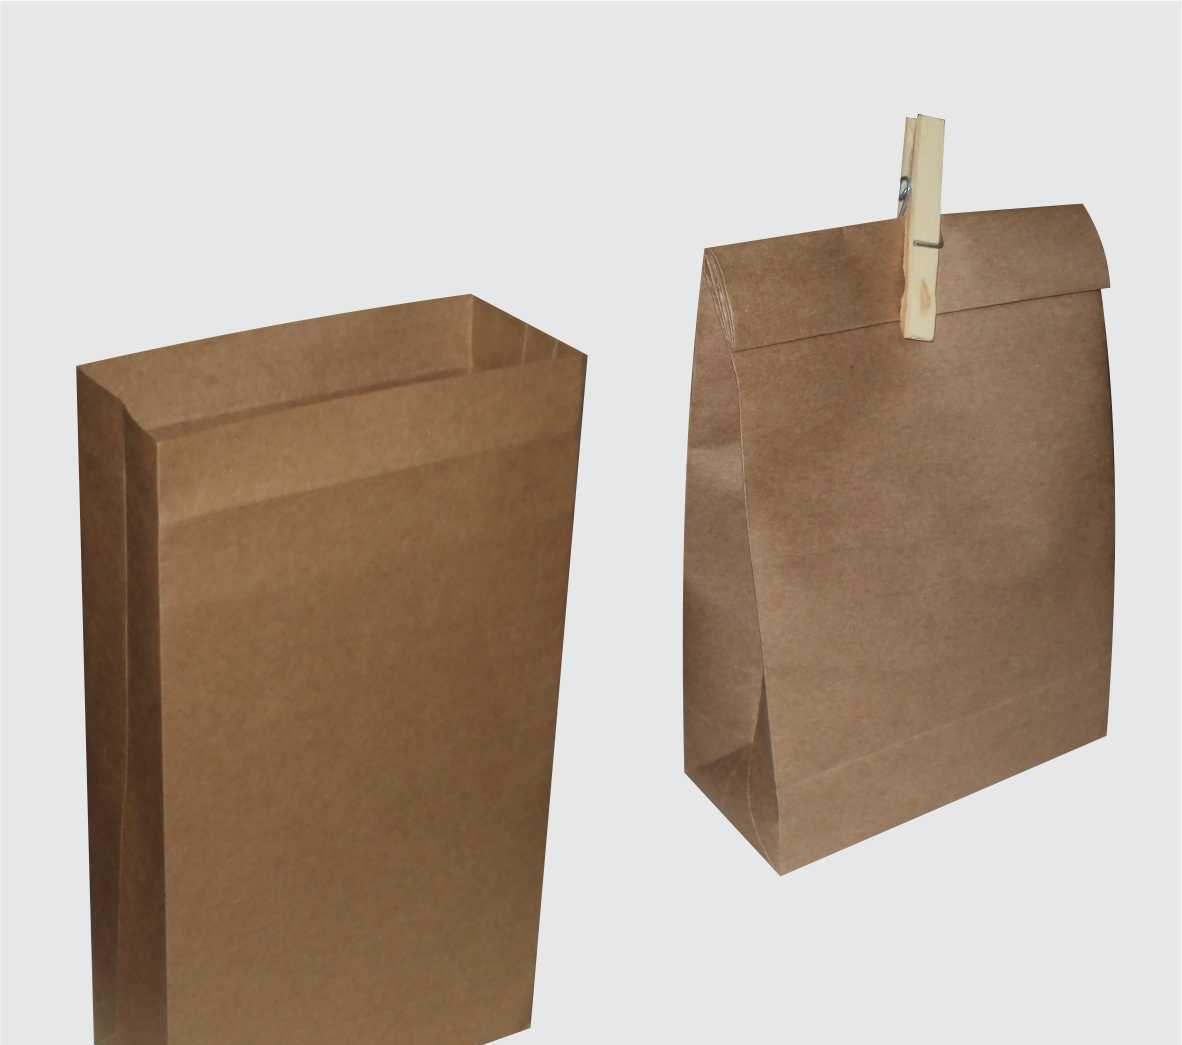 Saco kraft medio (18x29x8 cm) - cor parda - 10 unidades